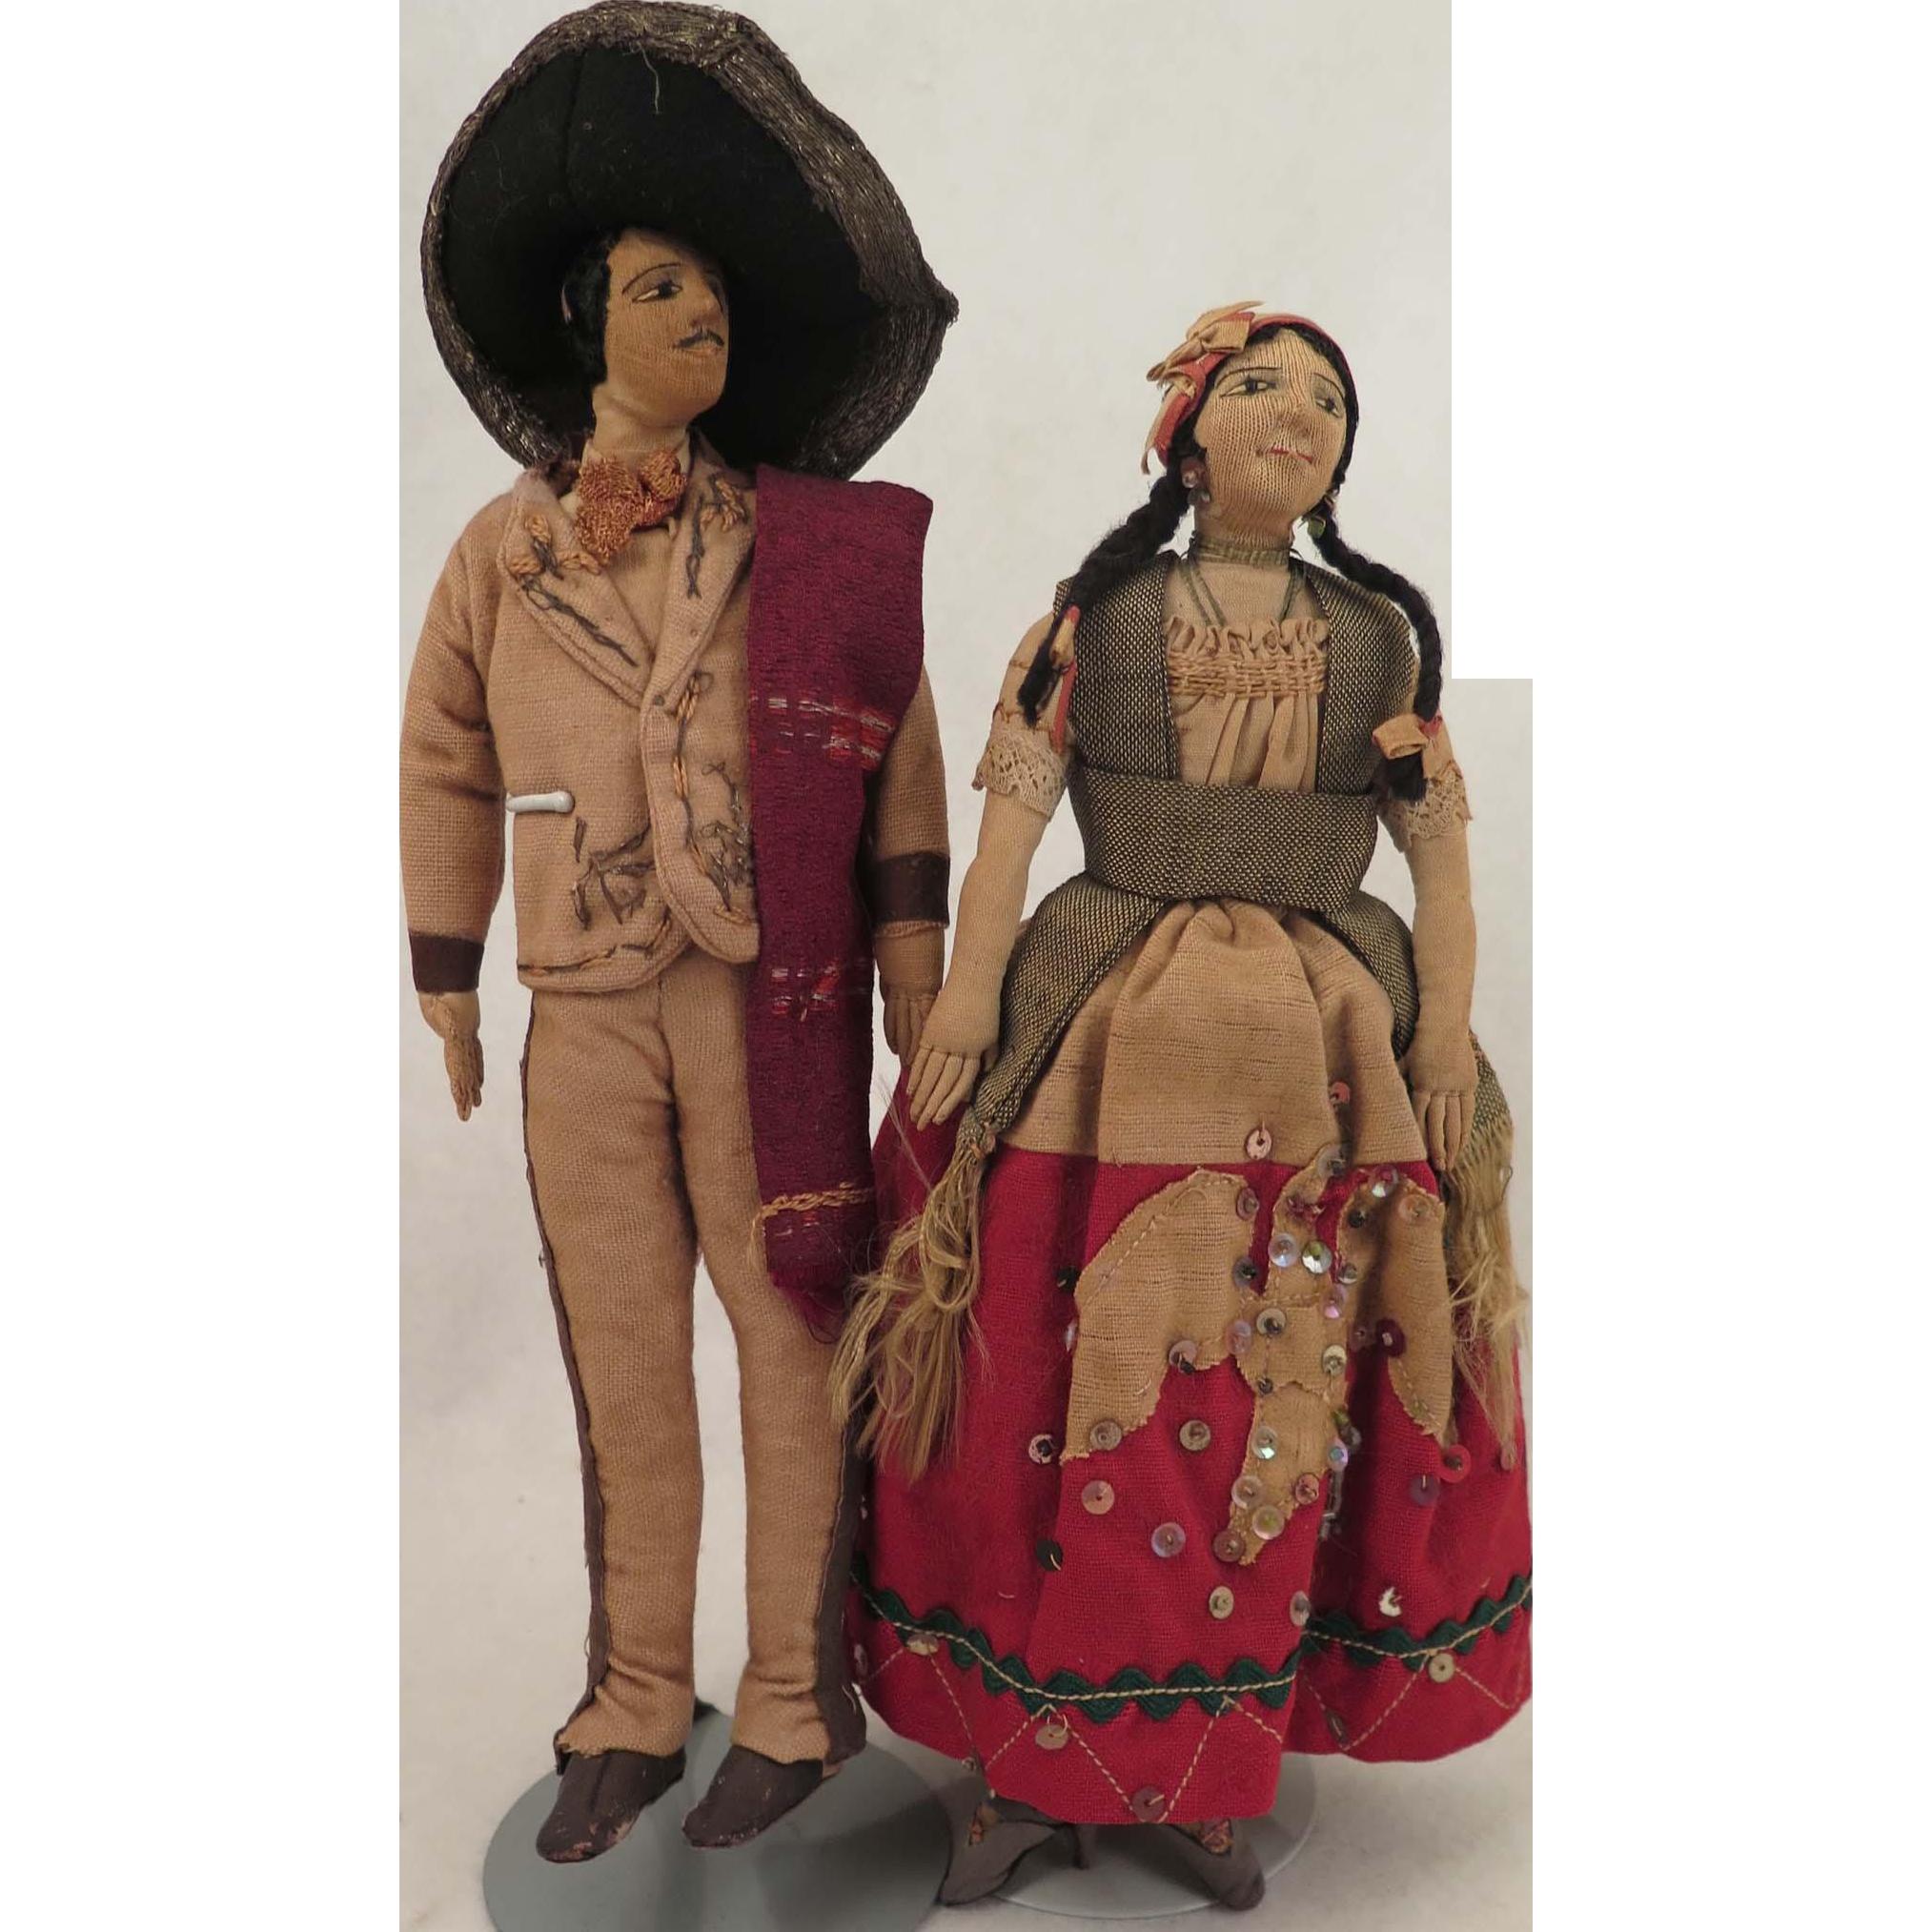 Mexican Cloth Doll Pair 9 inches c. 1900